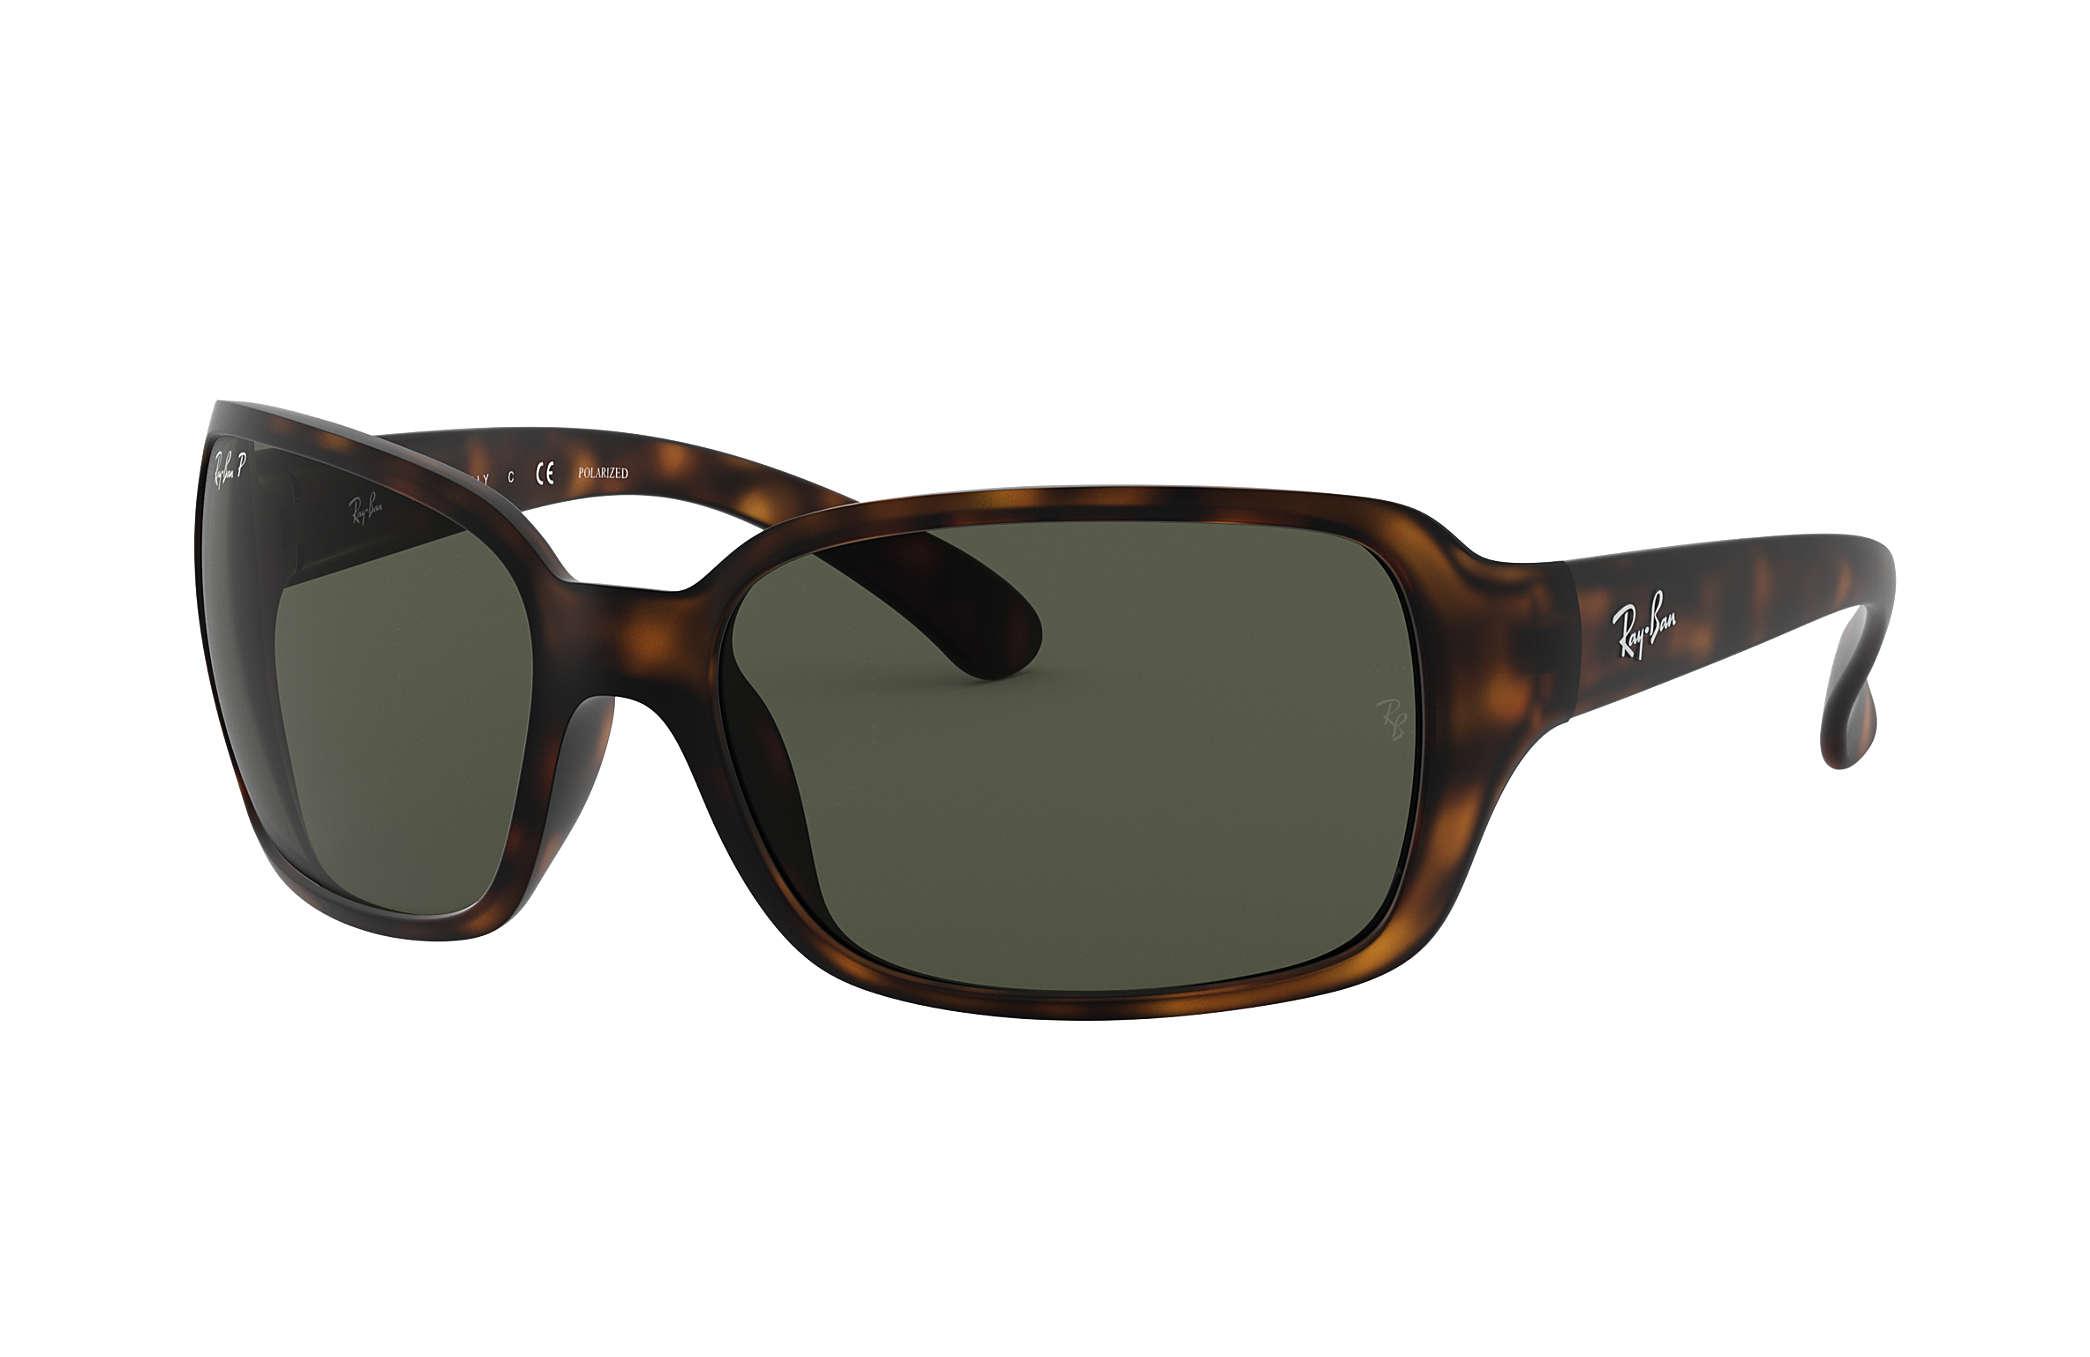 6c62f4ac2d1 Ray-Ban RB4068 Tortoise - Nylon - Green Polarized Lenses ...